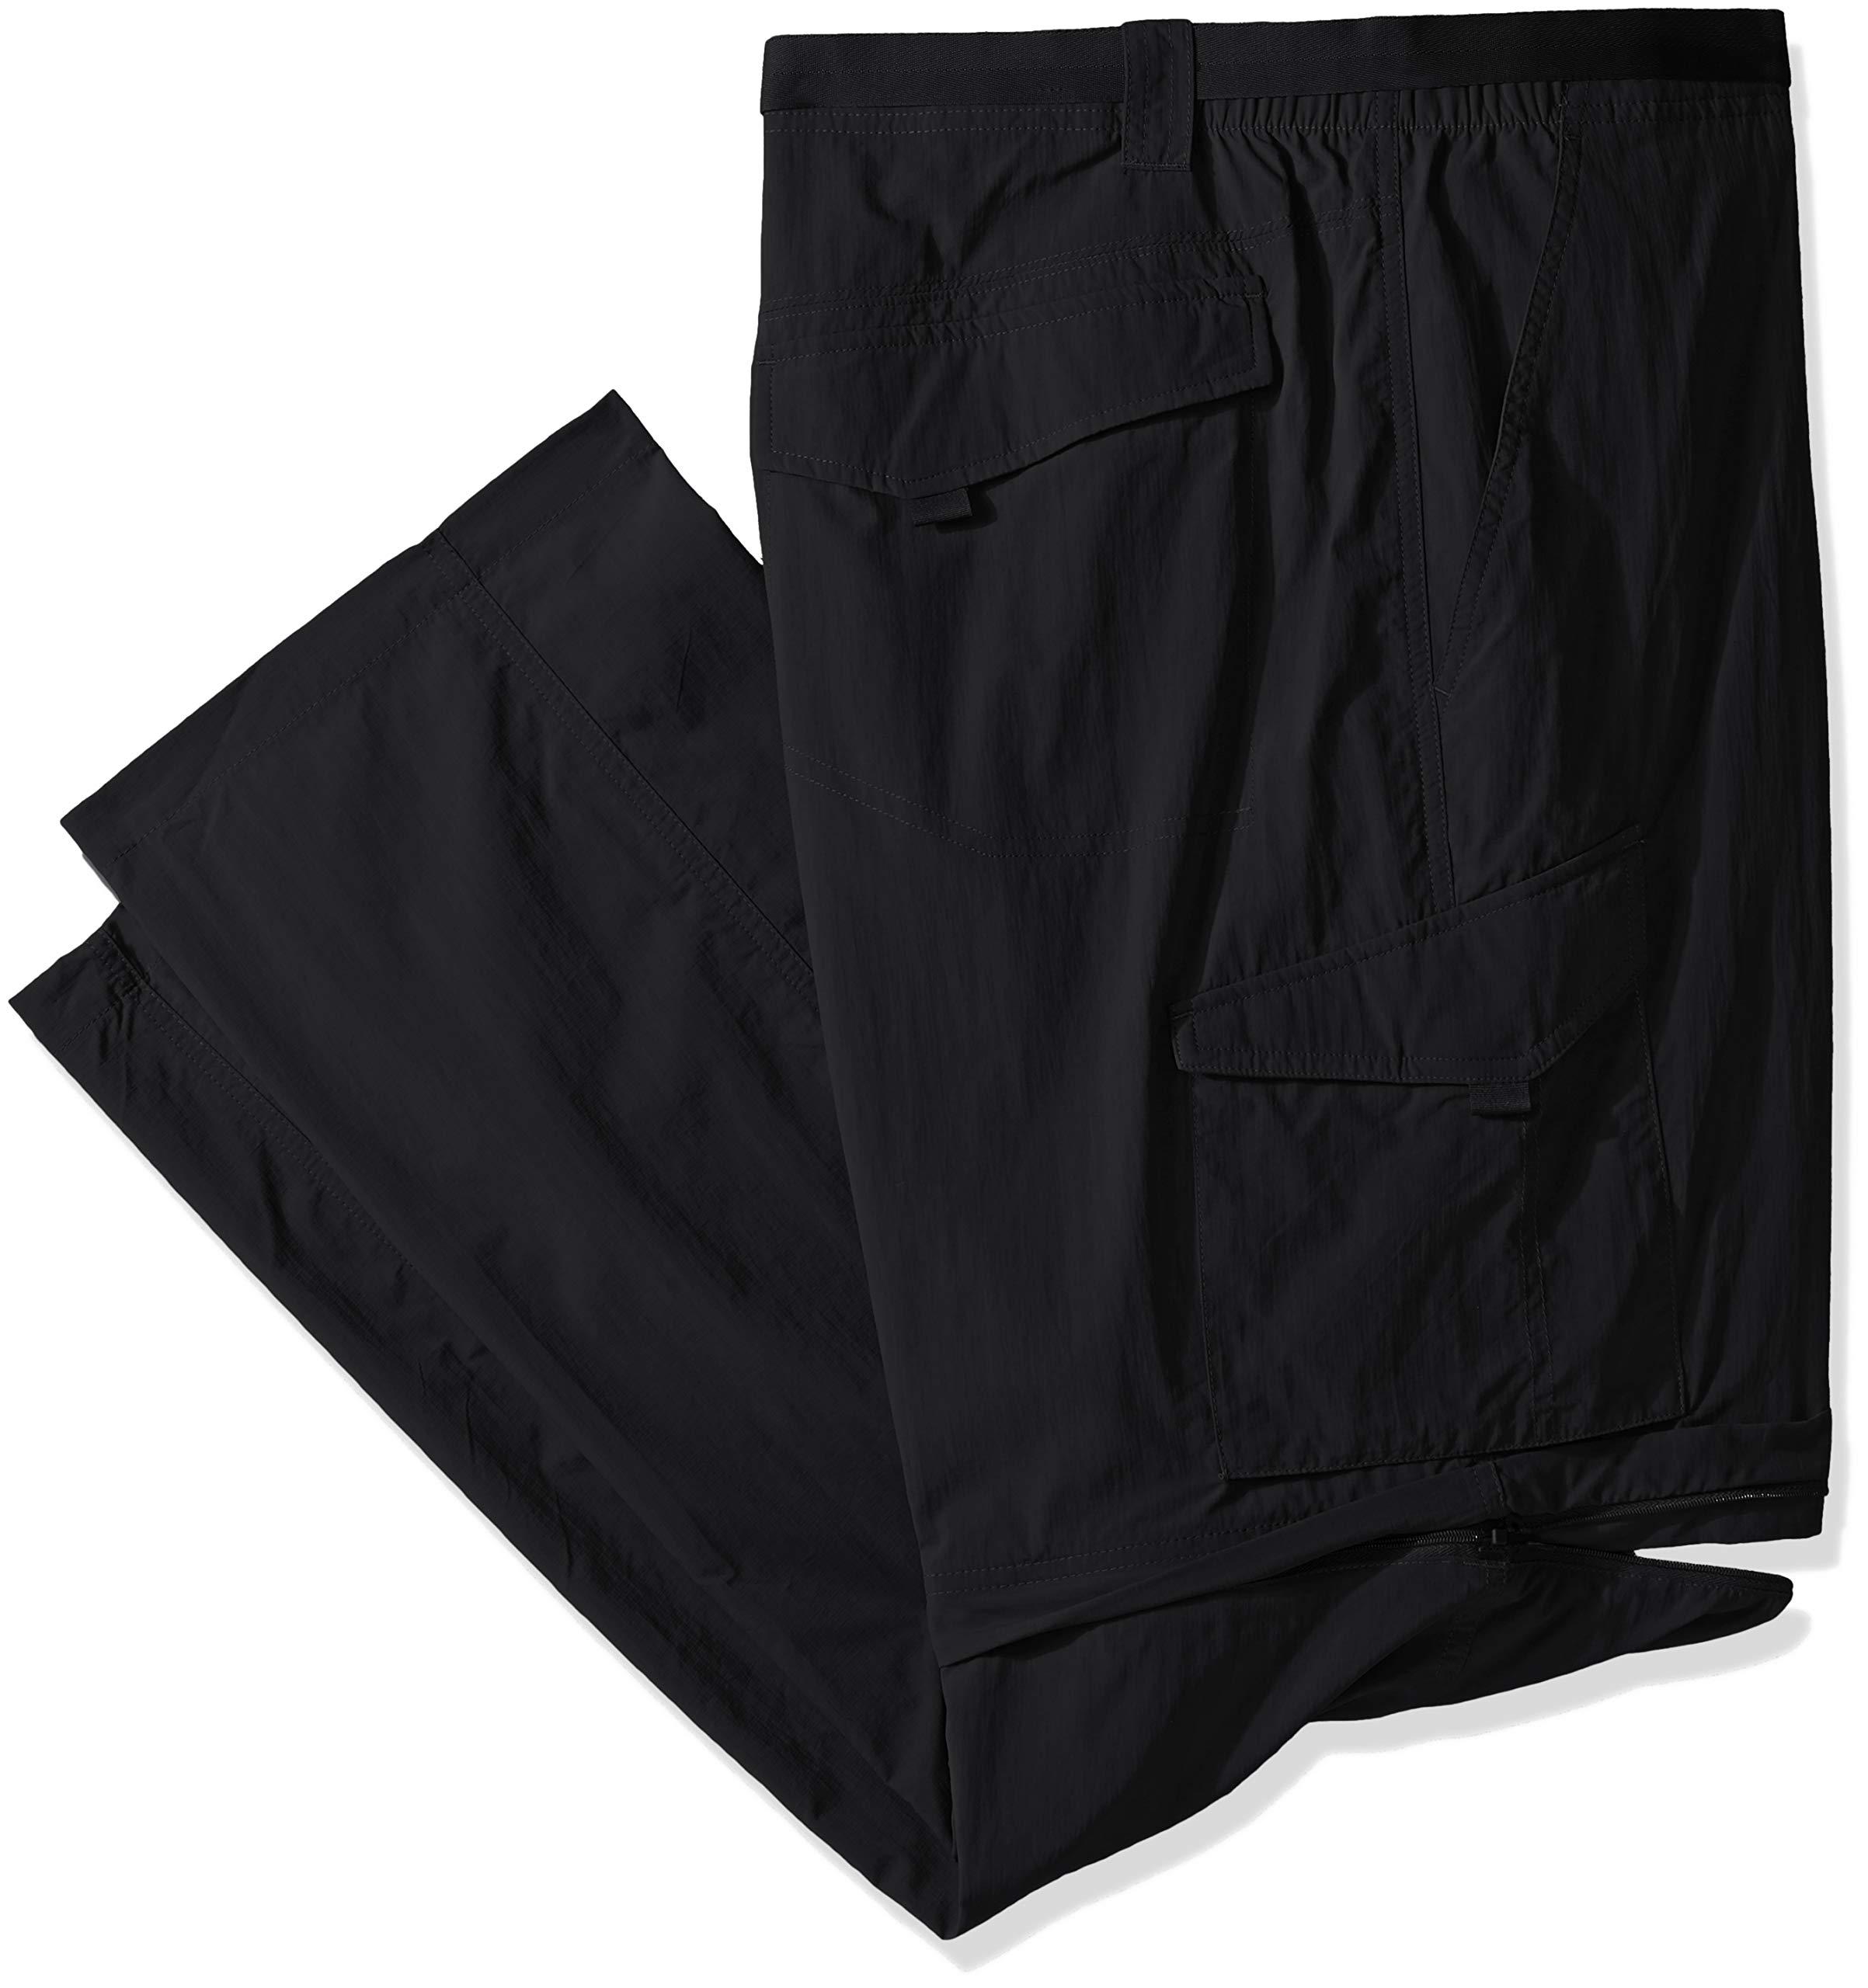 Columbia Sportswear Men's Big and Tall Silver Ridge Convertible Pant, Black, 46 x 34-Inch